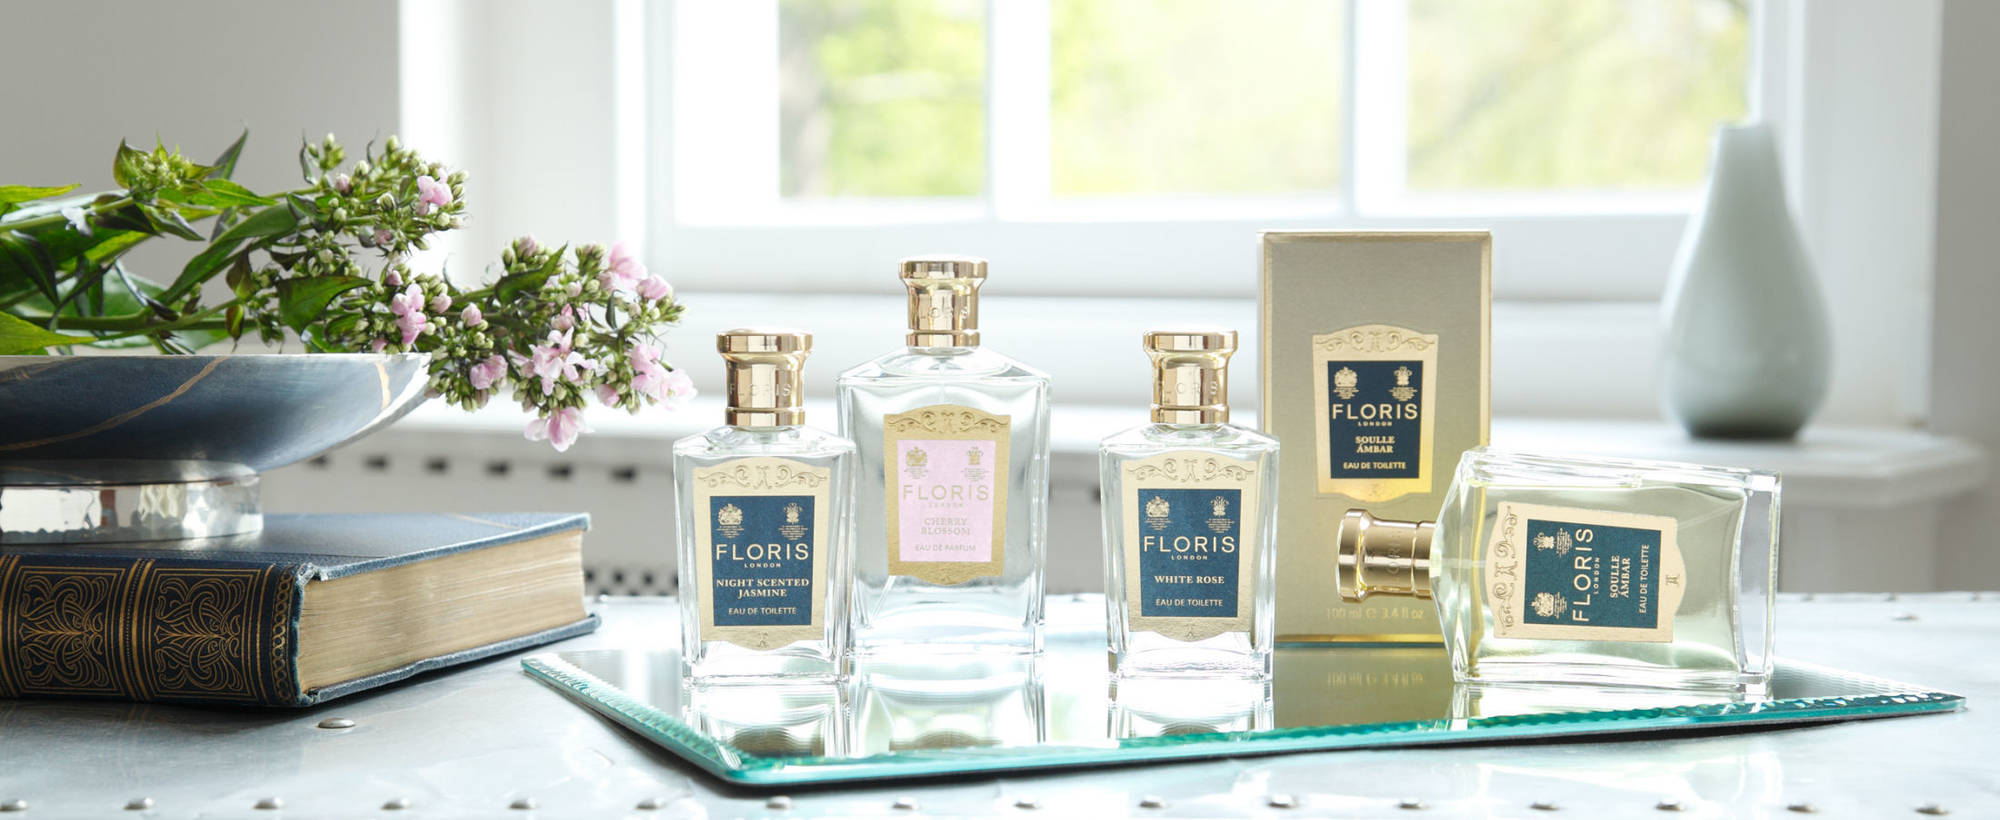 Floris Perfume 1